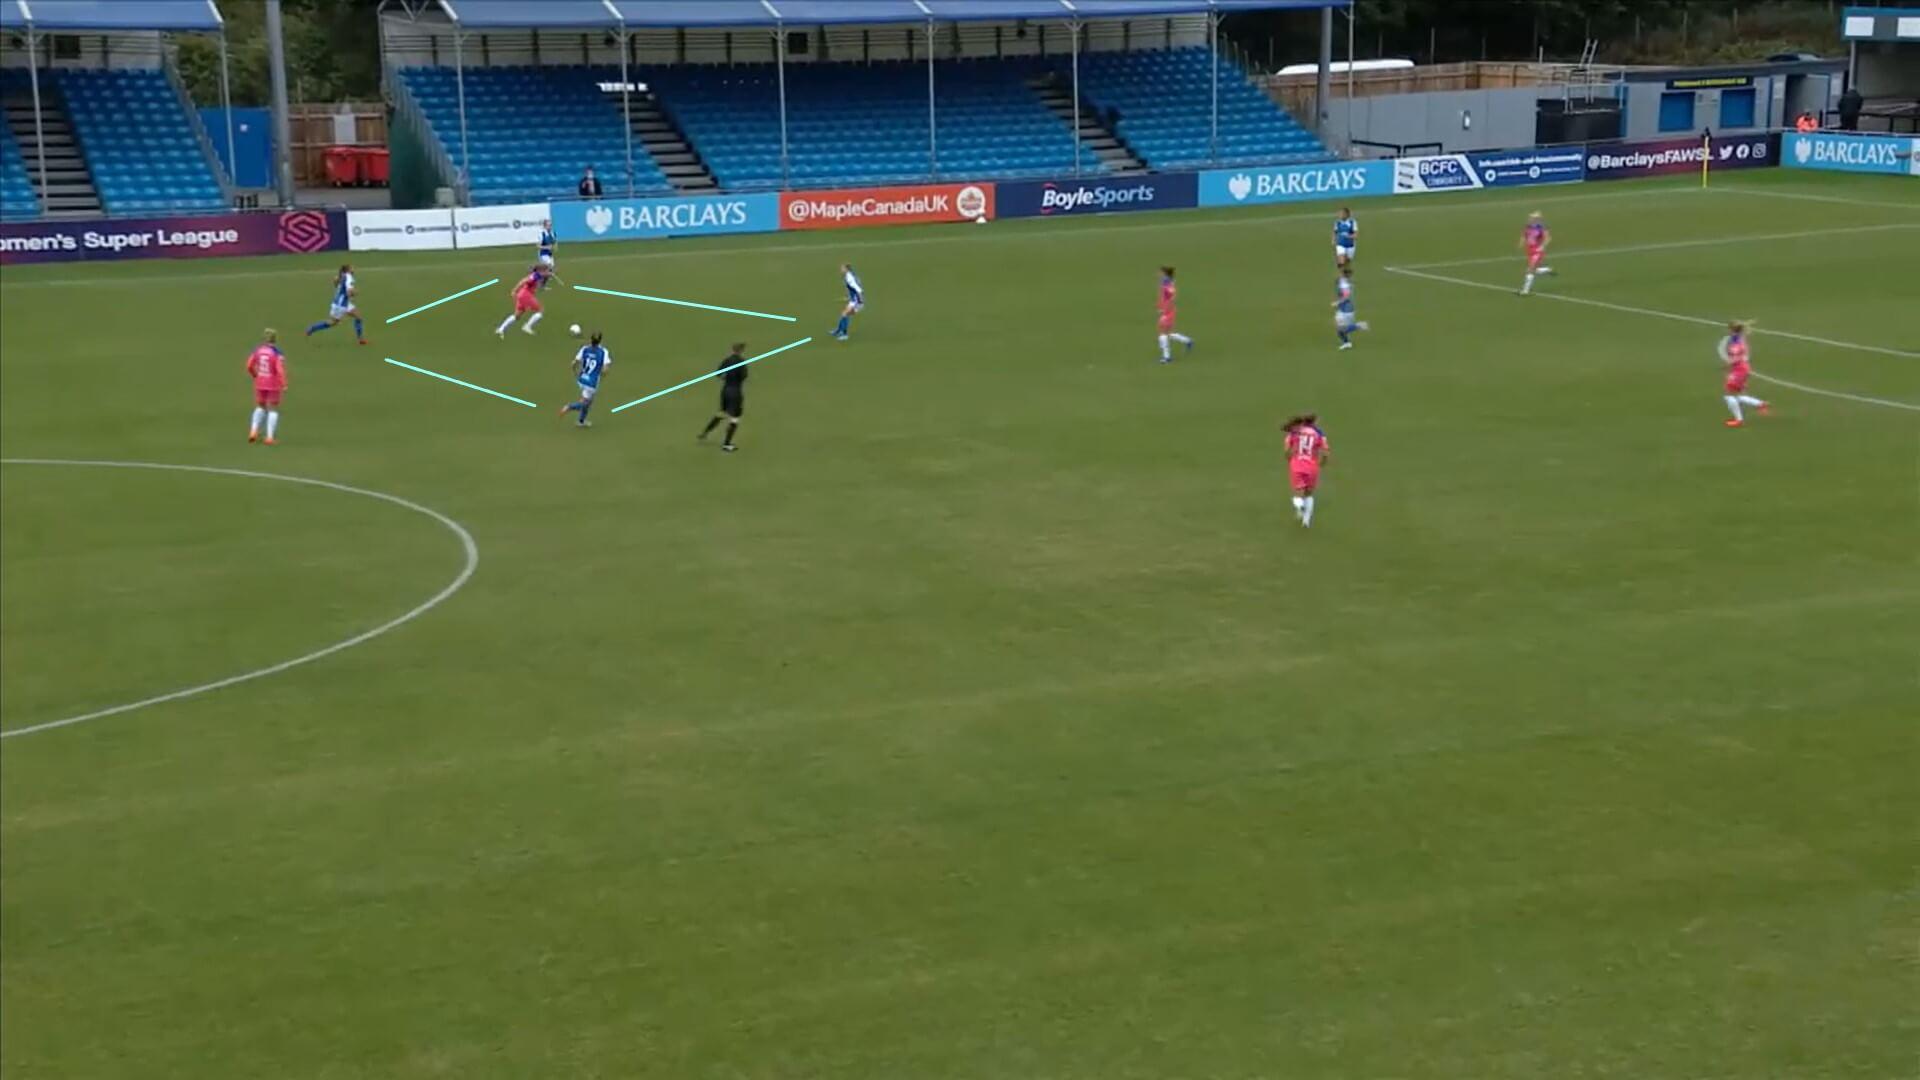 FAWSL 2020/2021: Birmingham City Women v Chelsea Women - tactical analysis tactics